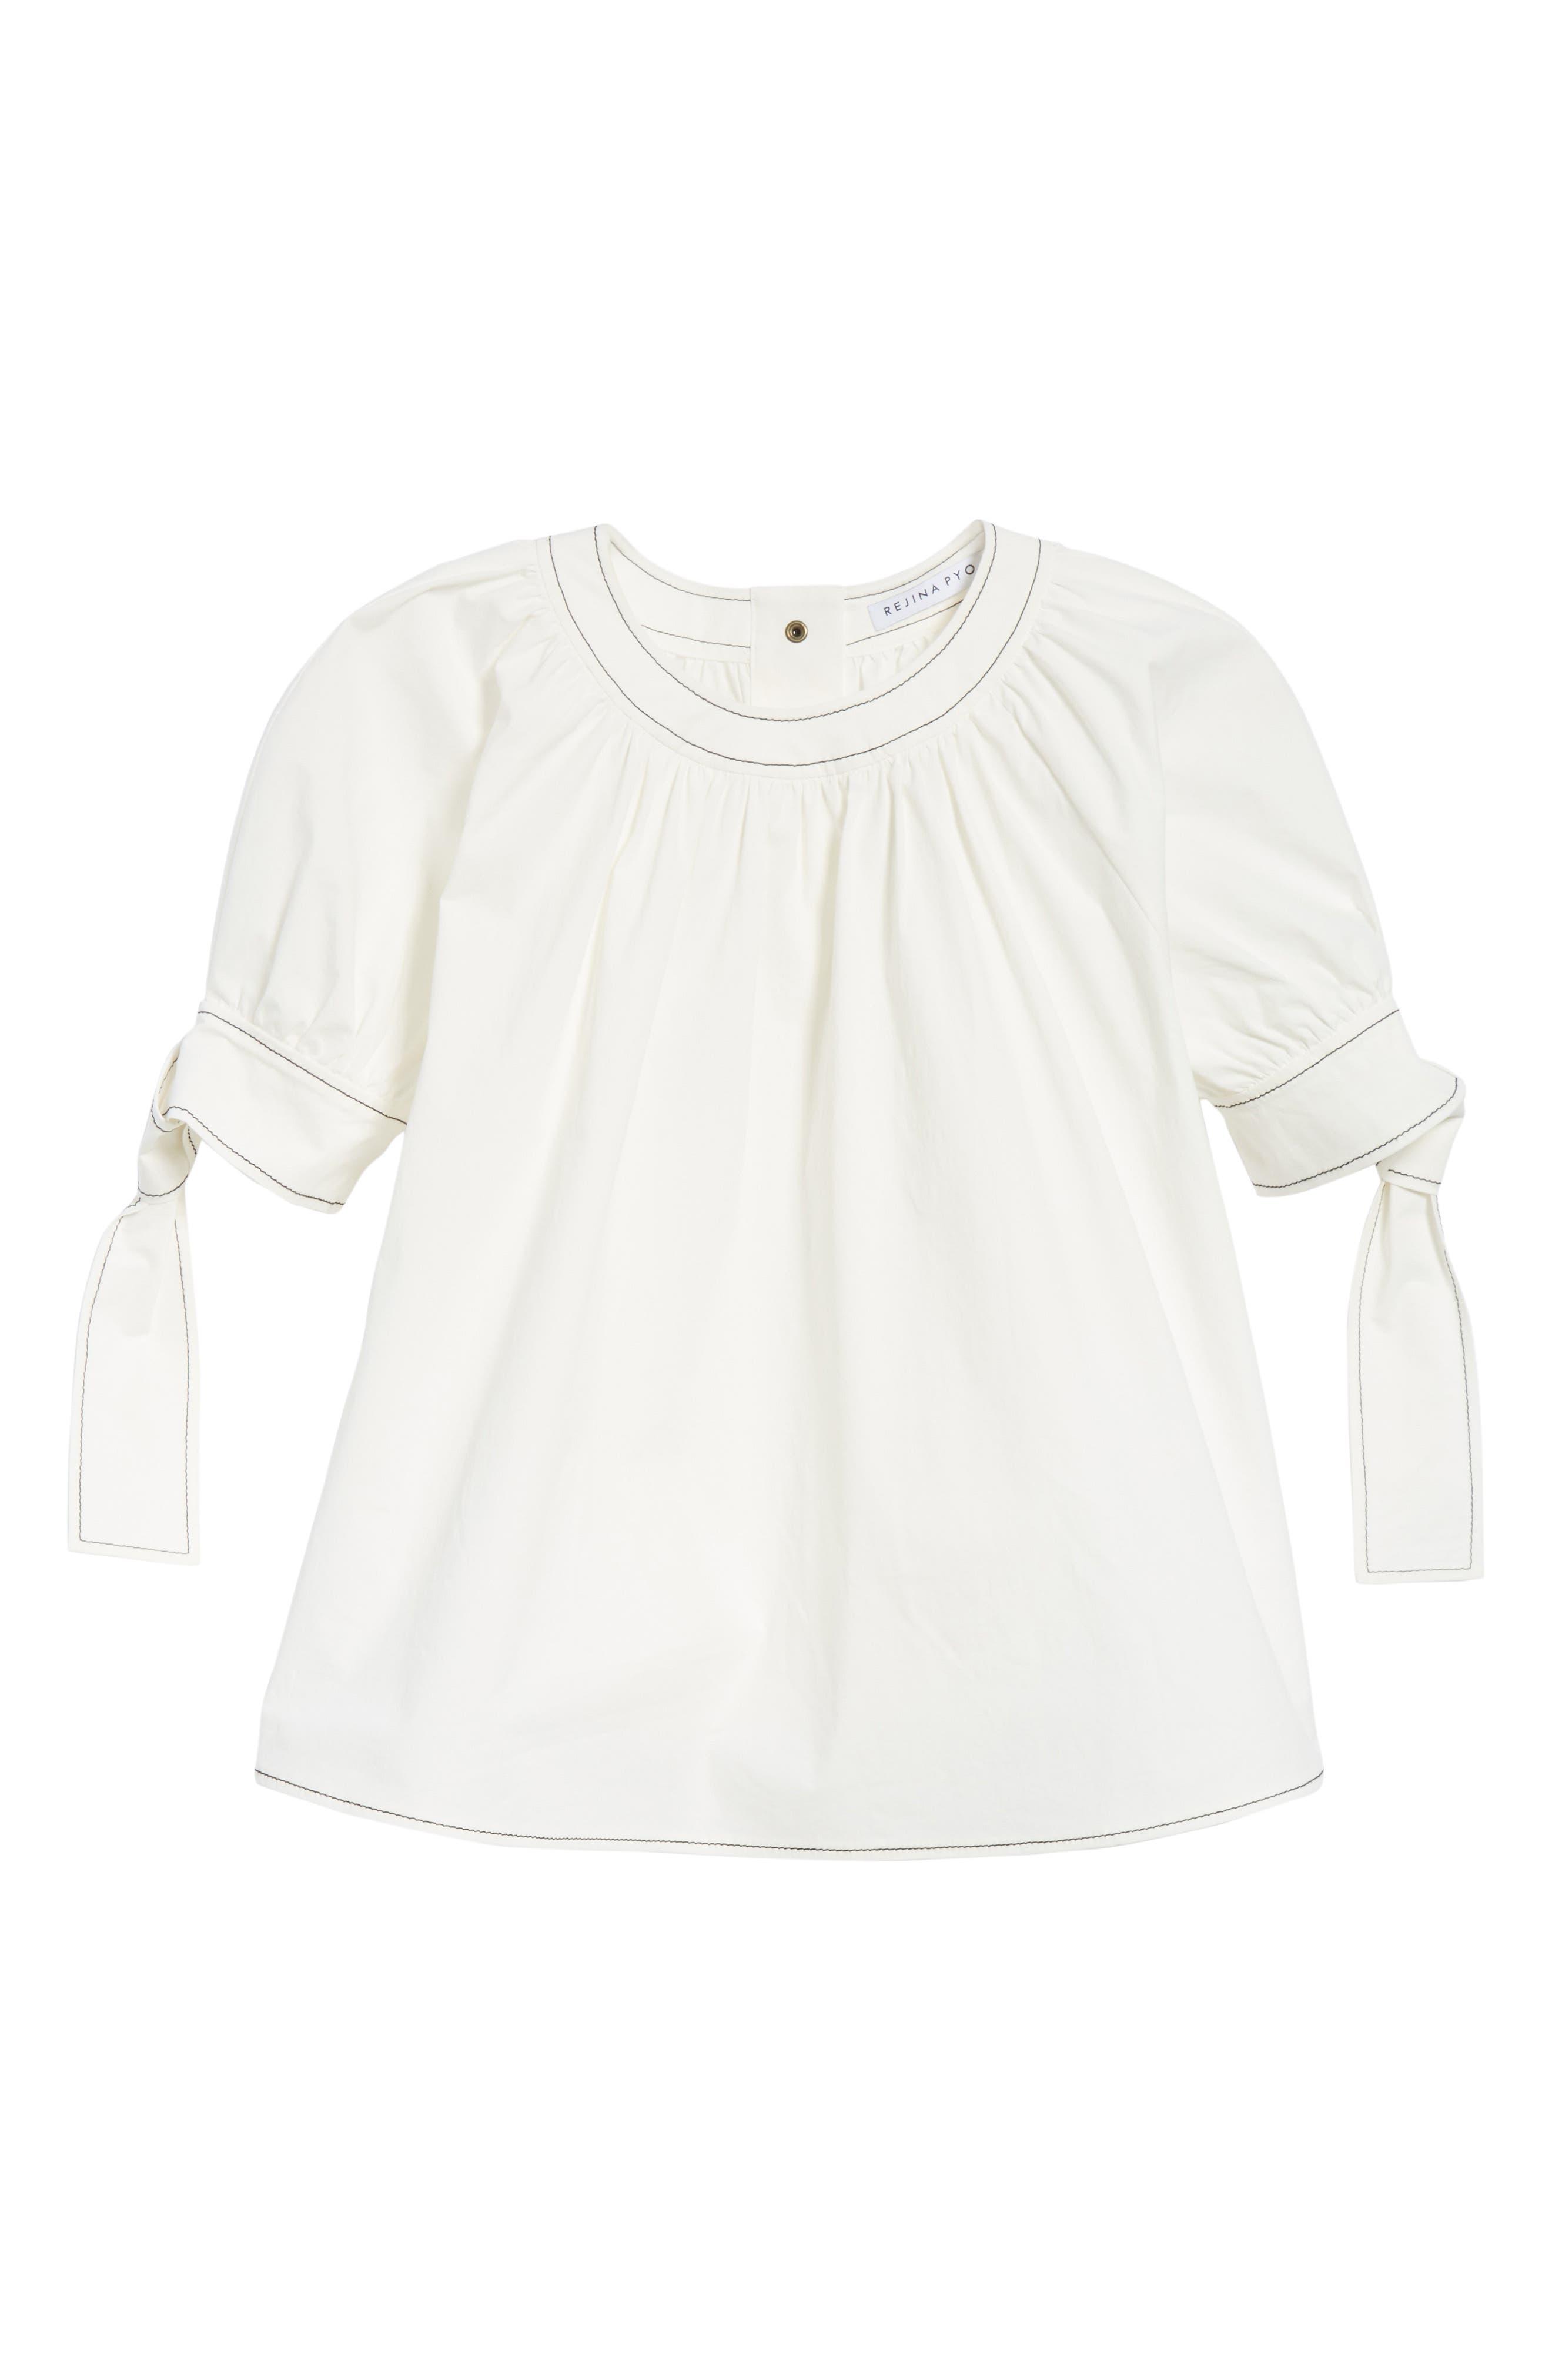 Hailey Short Sleeve Blouse Top,                             Alternate thumbnail 6, color,                             Cotton White